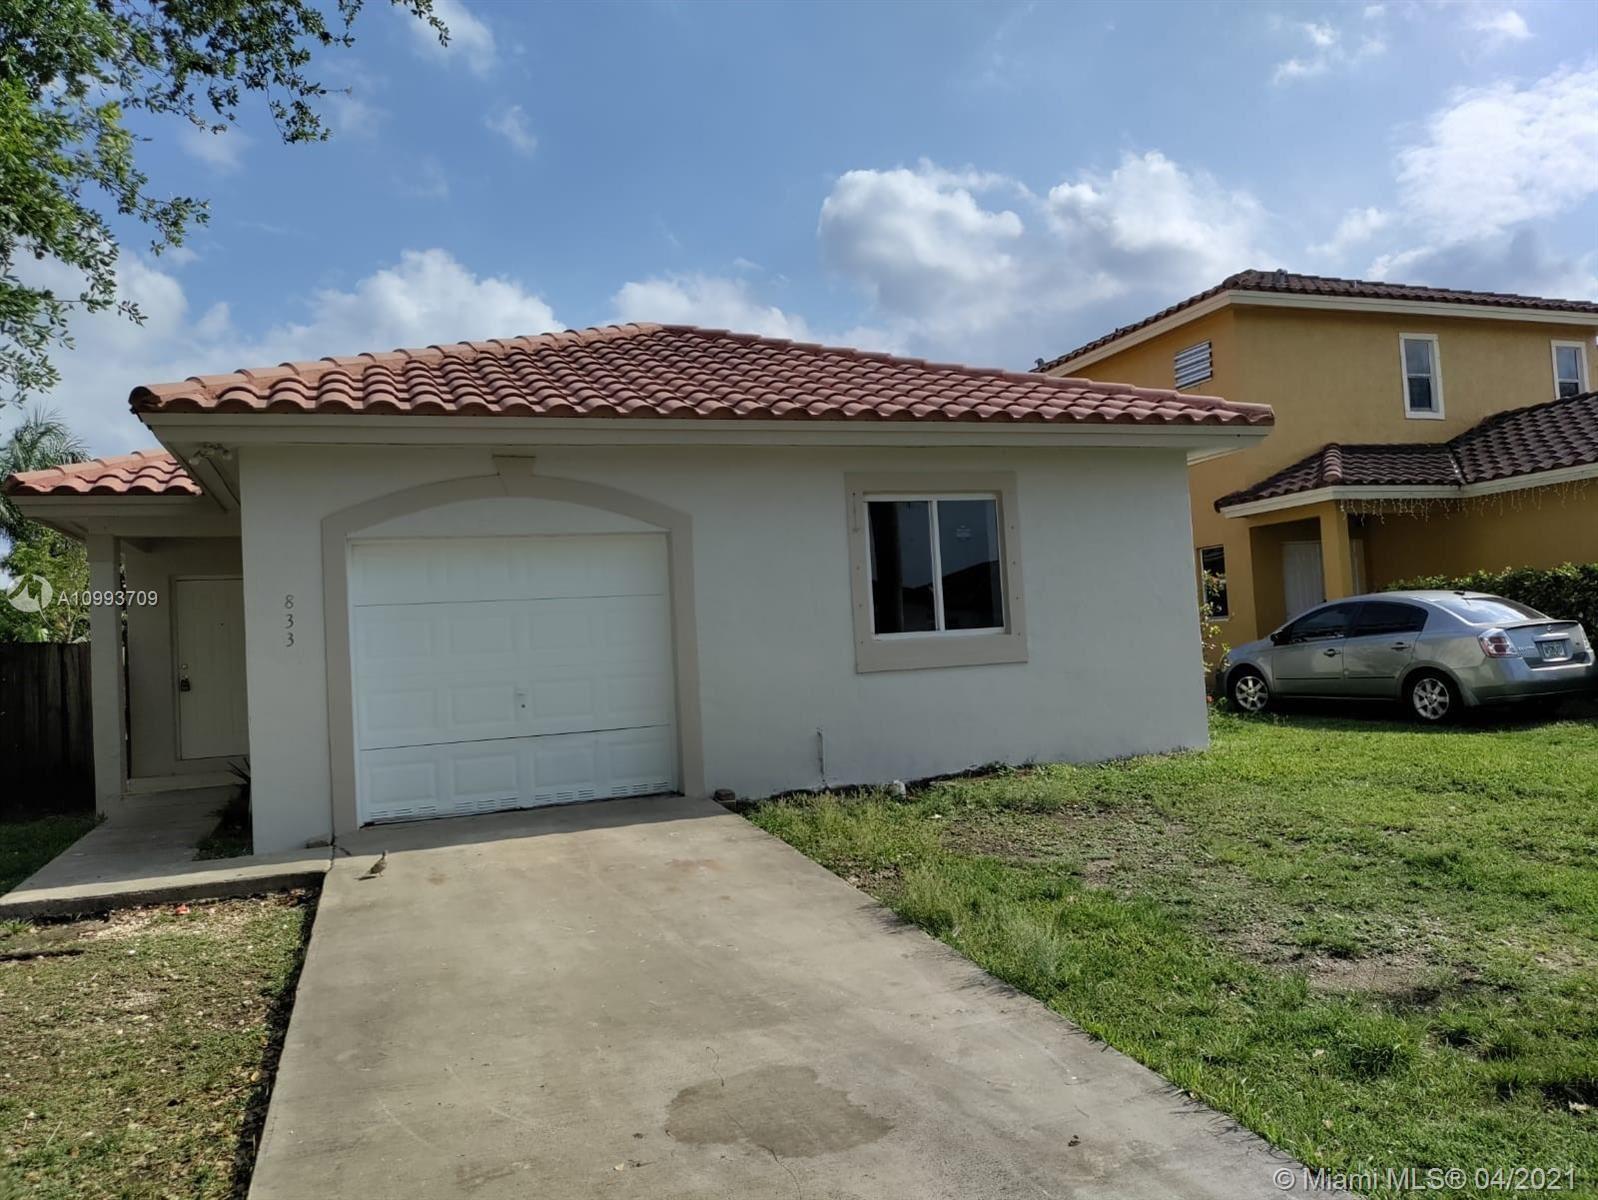 833 SW 6th St, Florida City, FL 33034 - #: A10993709